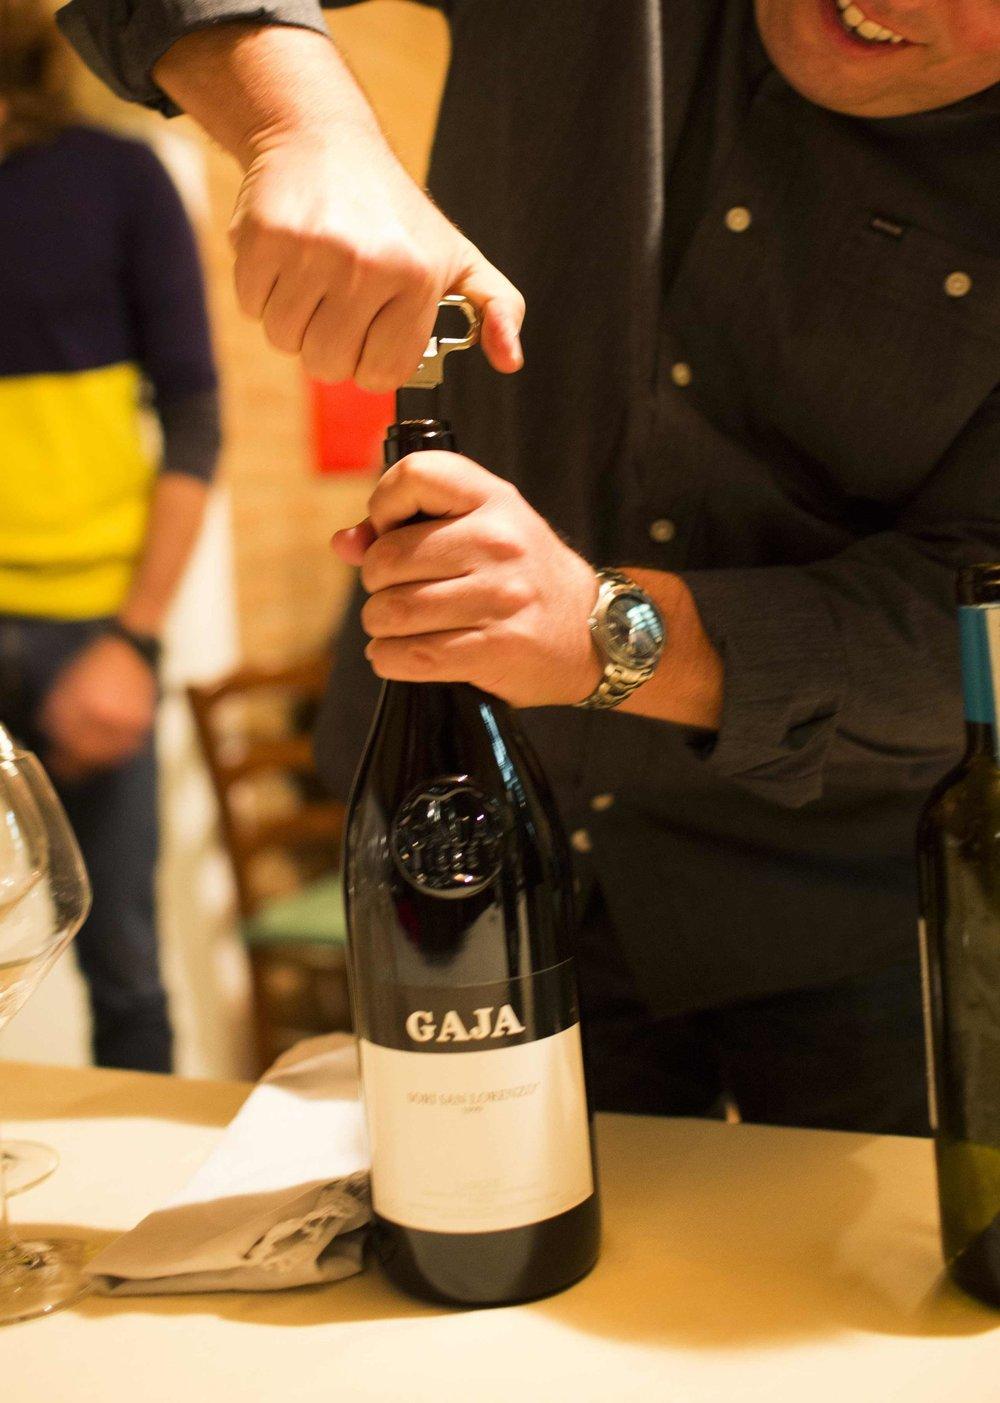 gaja barbaresco wine tasting